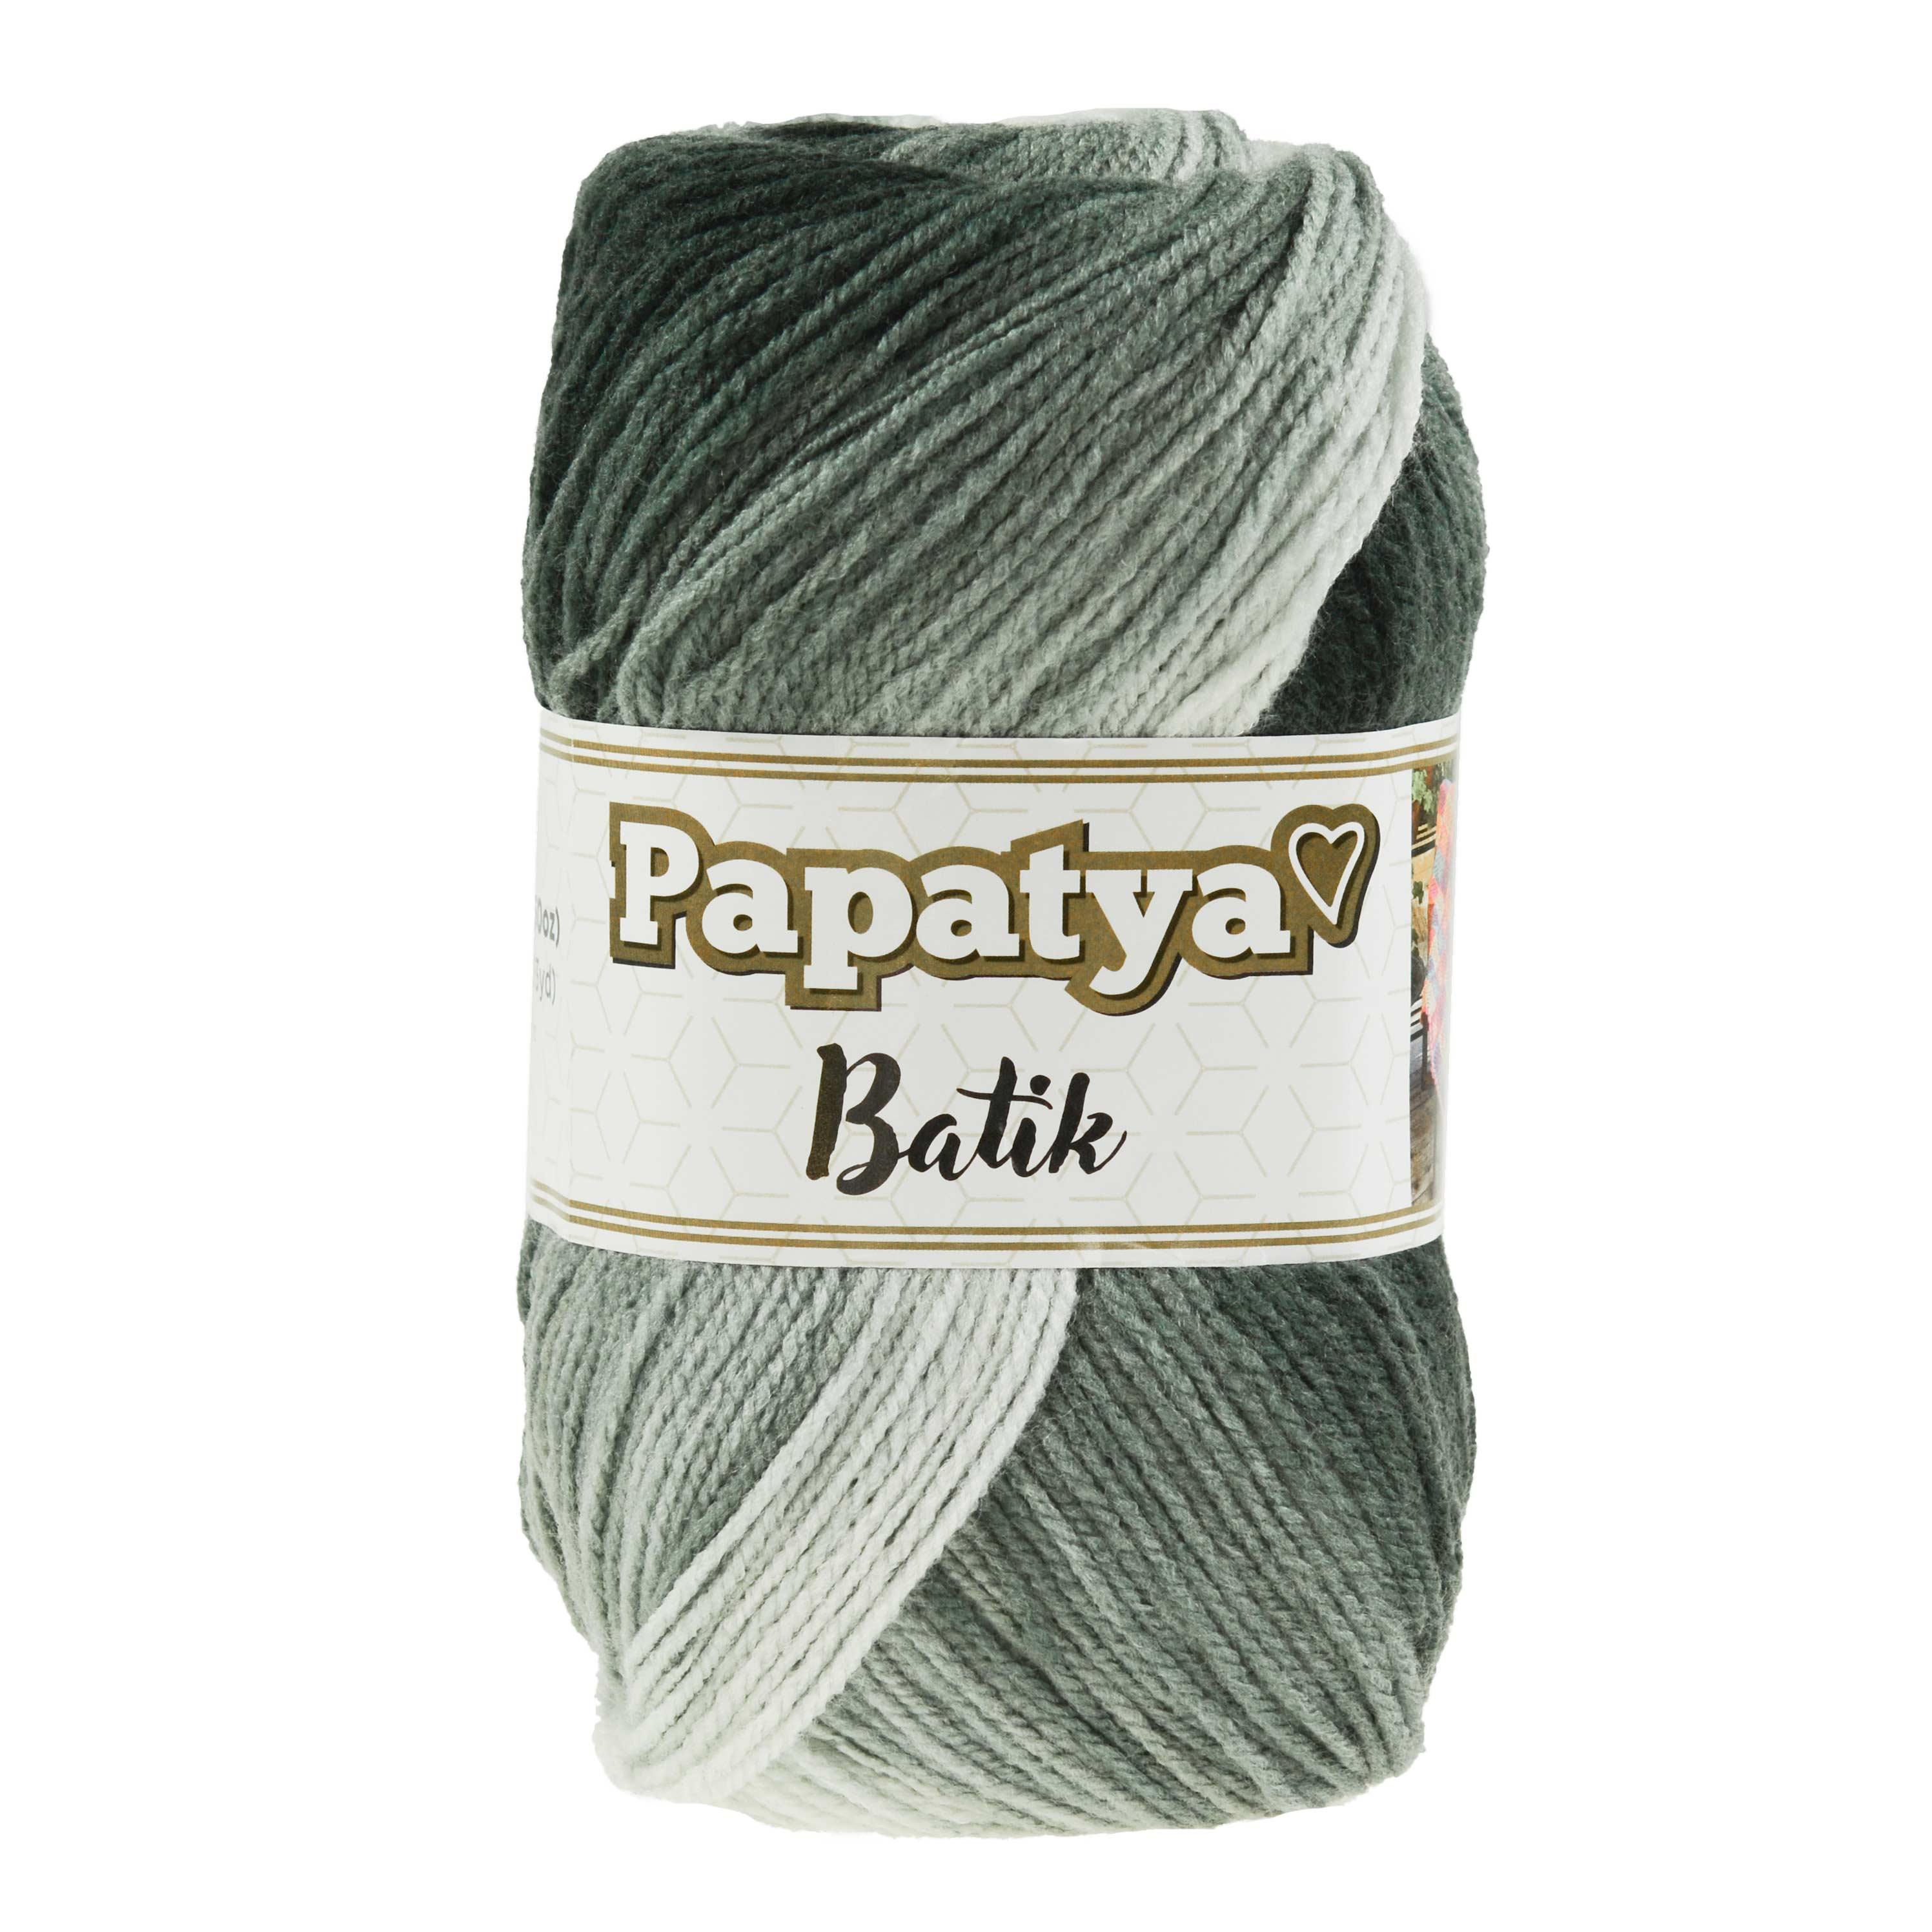 500g Farbverlaufsgarn Papatya Batik Strick-Wolle Strickgarn Häkelgarn Farbwahl – Bild 15